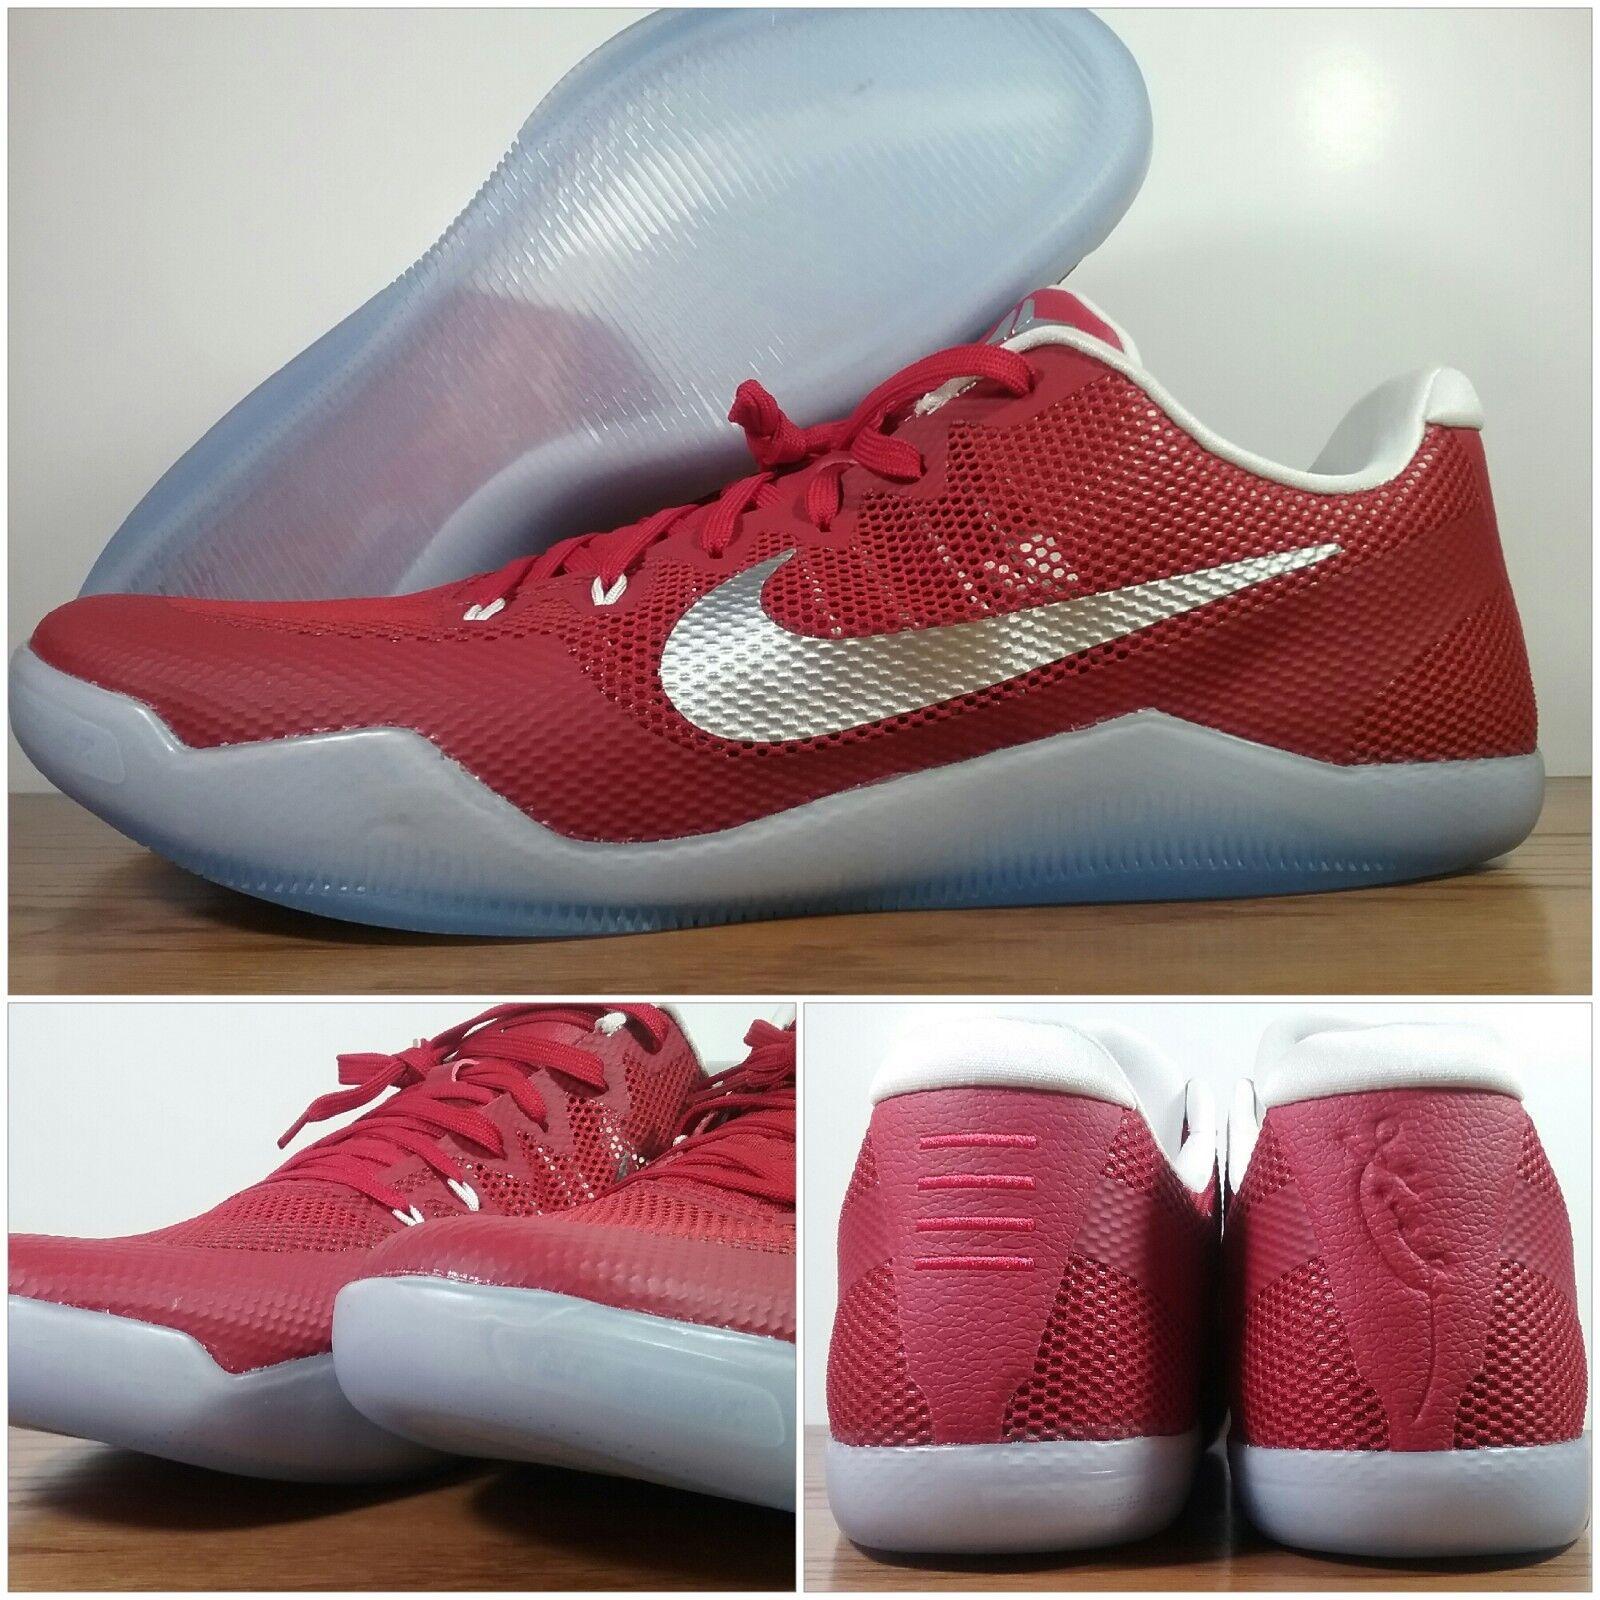 New Nike Men's Kobe XI TB Promo Team Red-Icy Basketball 856485-661 Men's Size 18